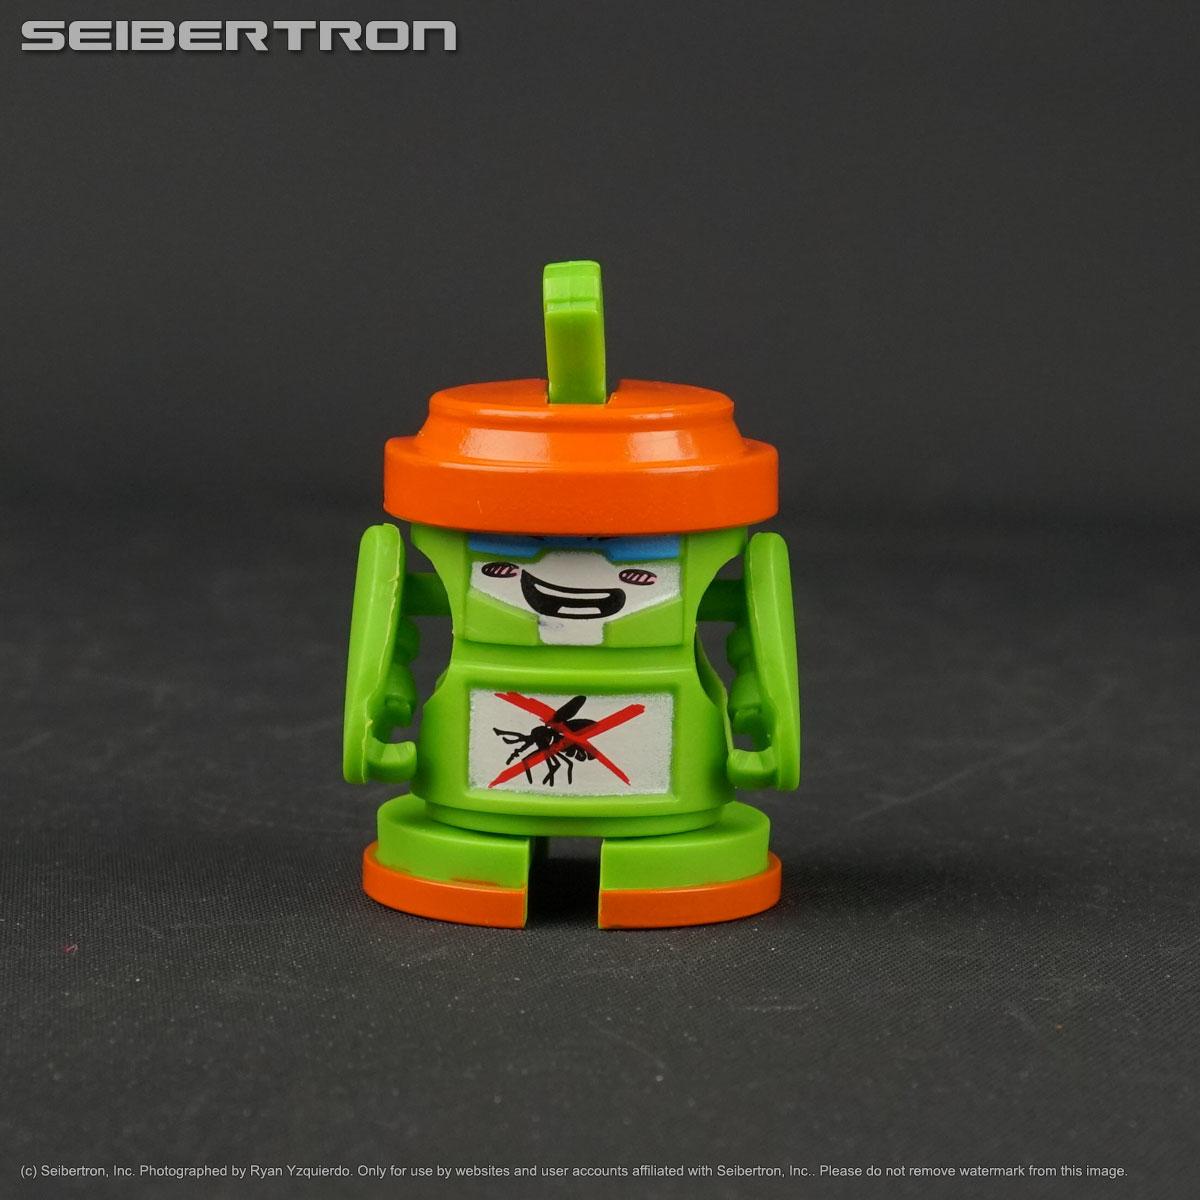 THE DETANGLER Transformers BotBots Series 2 Lost Bots 2019 conditioner bottle